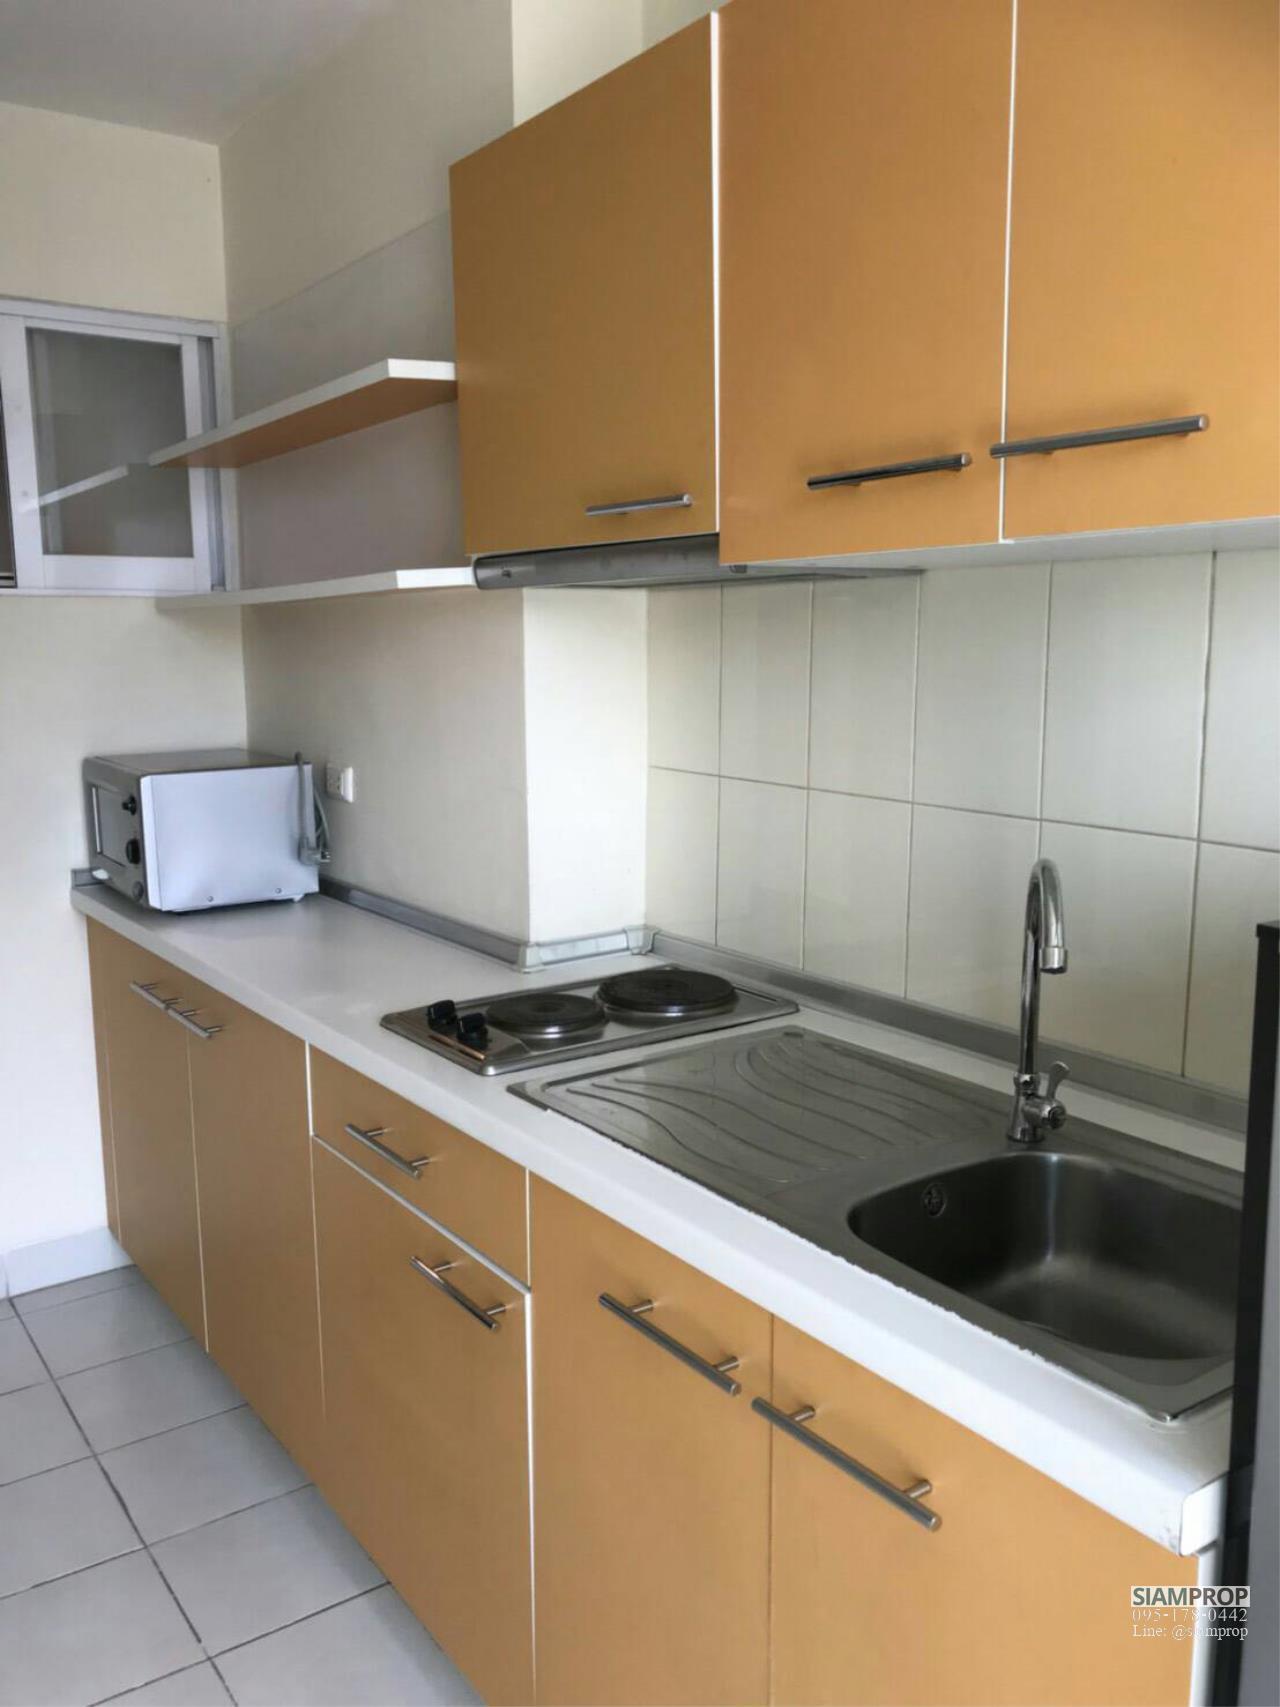 Siam Prop Agency's Life@65 Sukhumvit 65 , 1 bedroom for rent  8